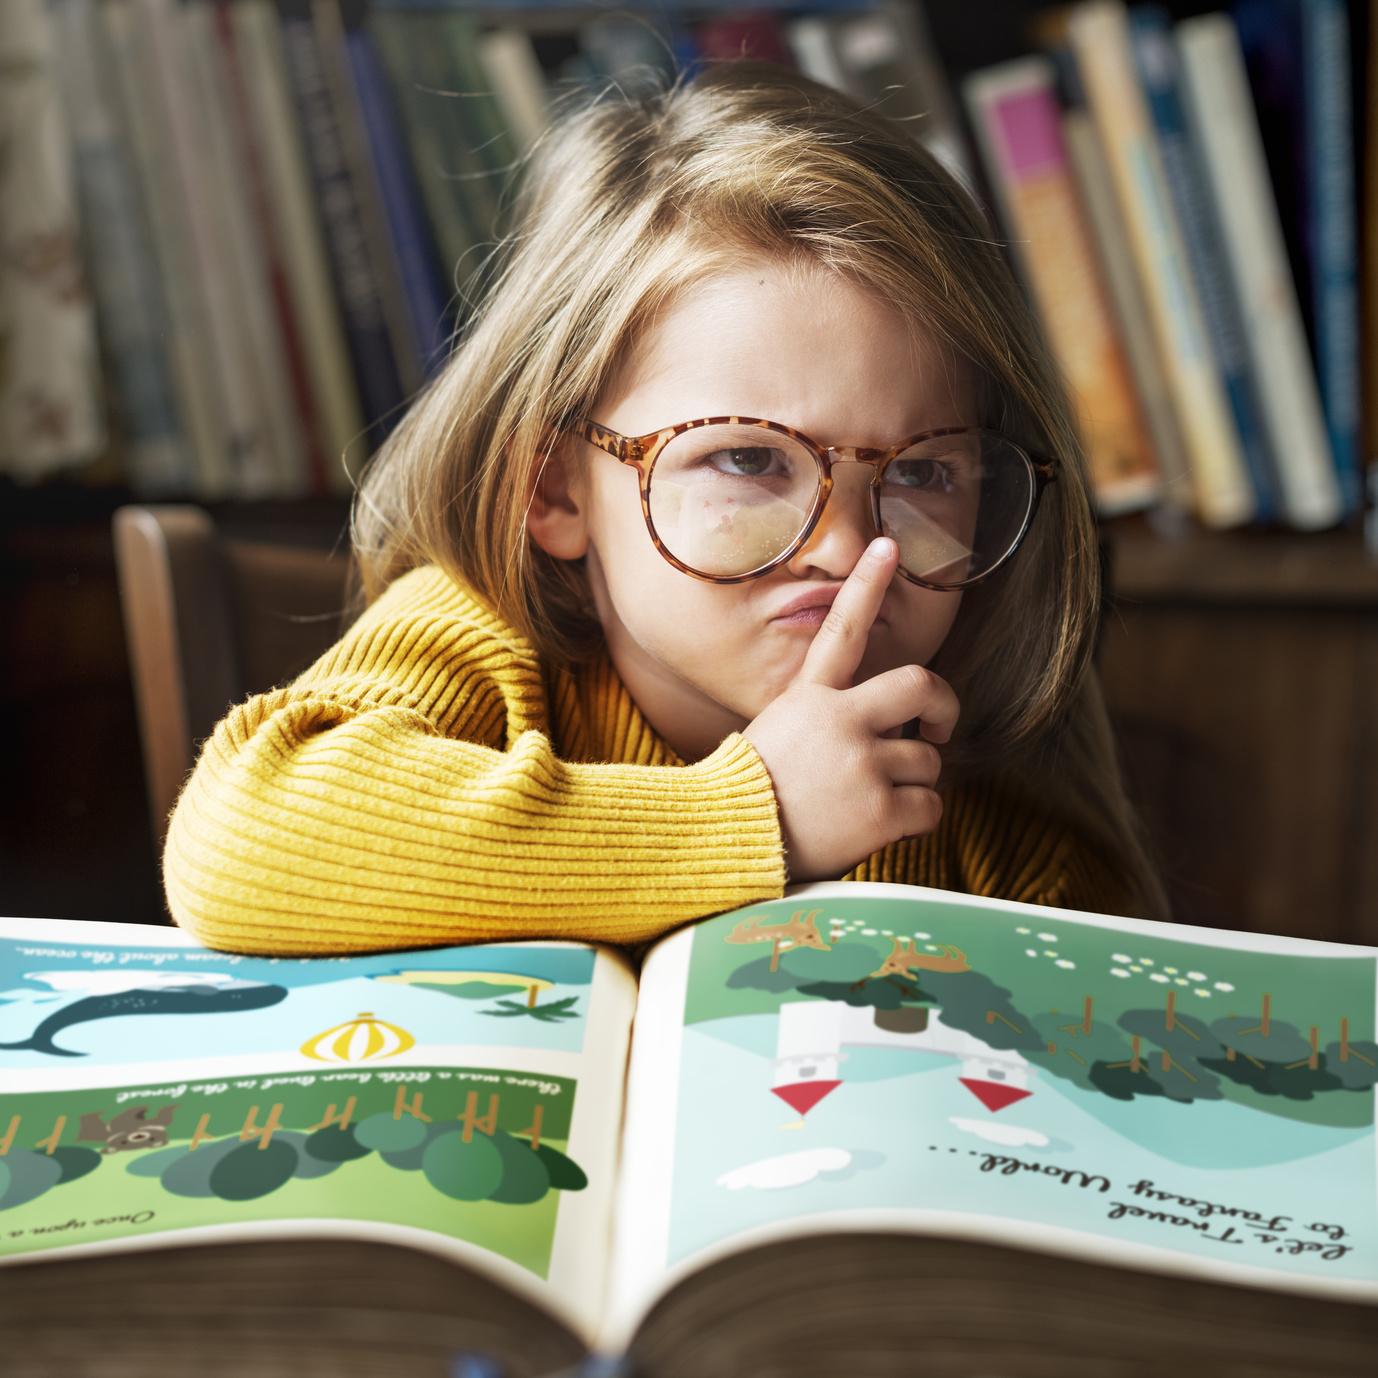 adorable cute girl reading storytelling concept - hsb akademie